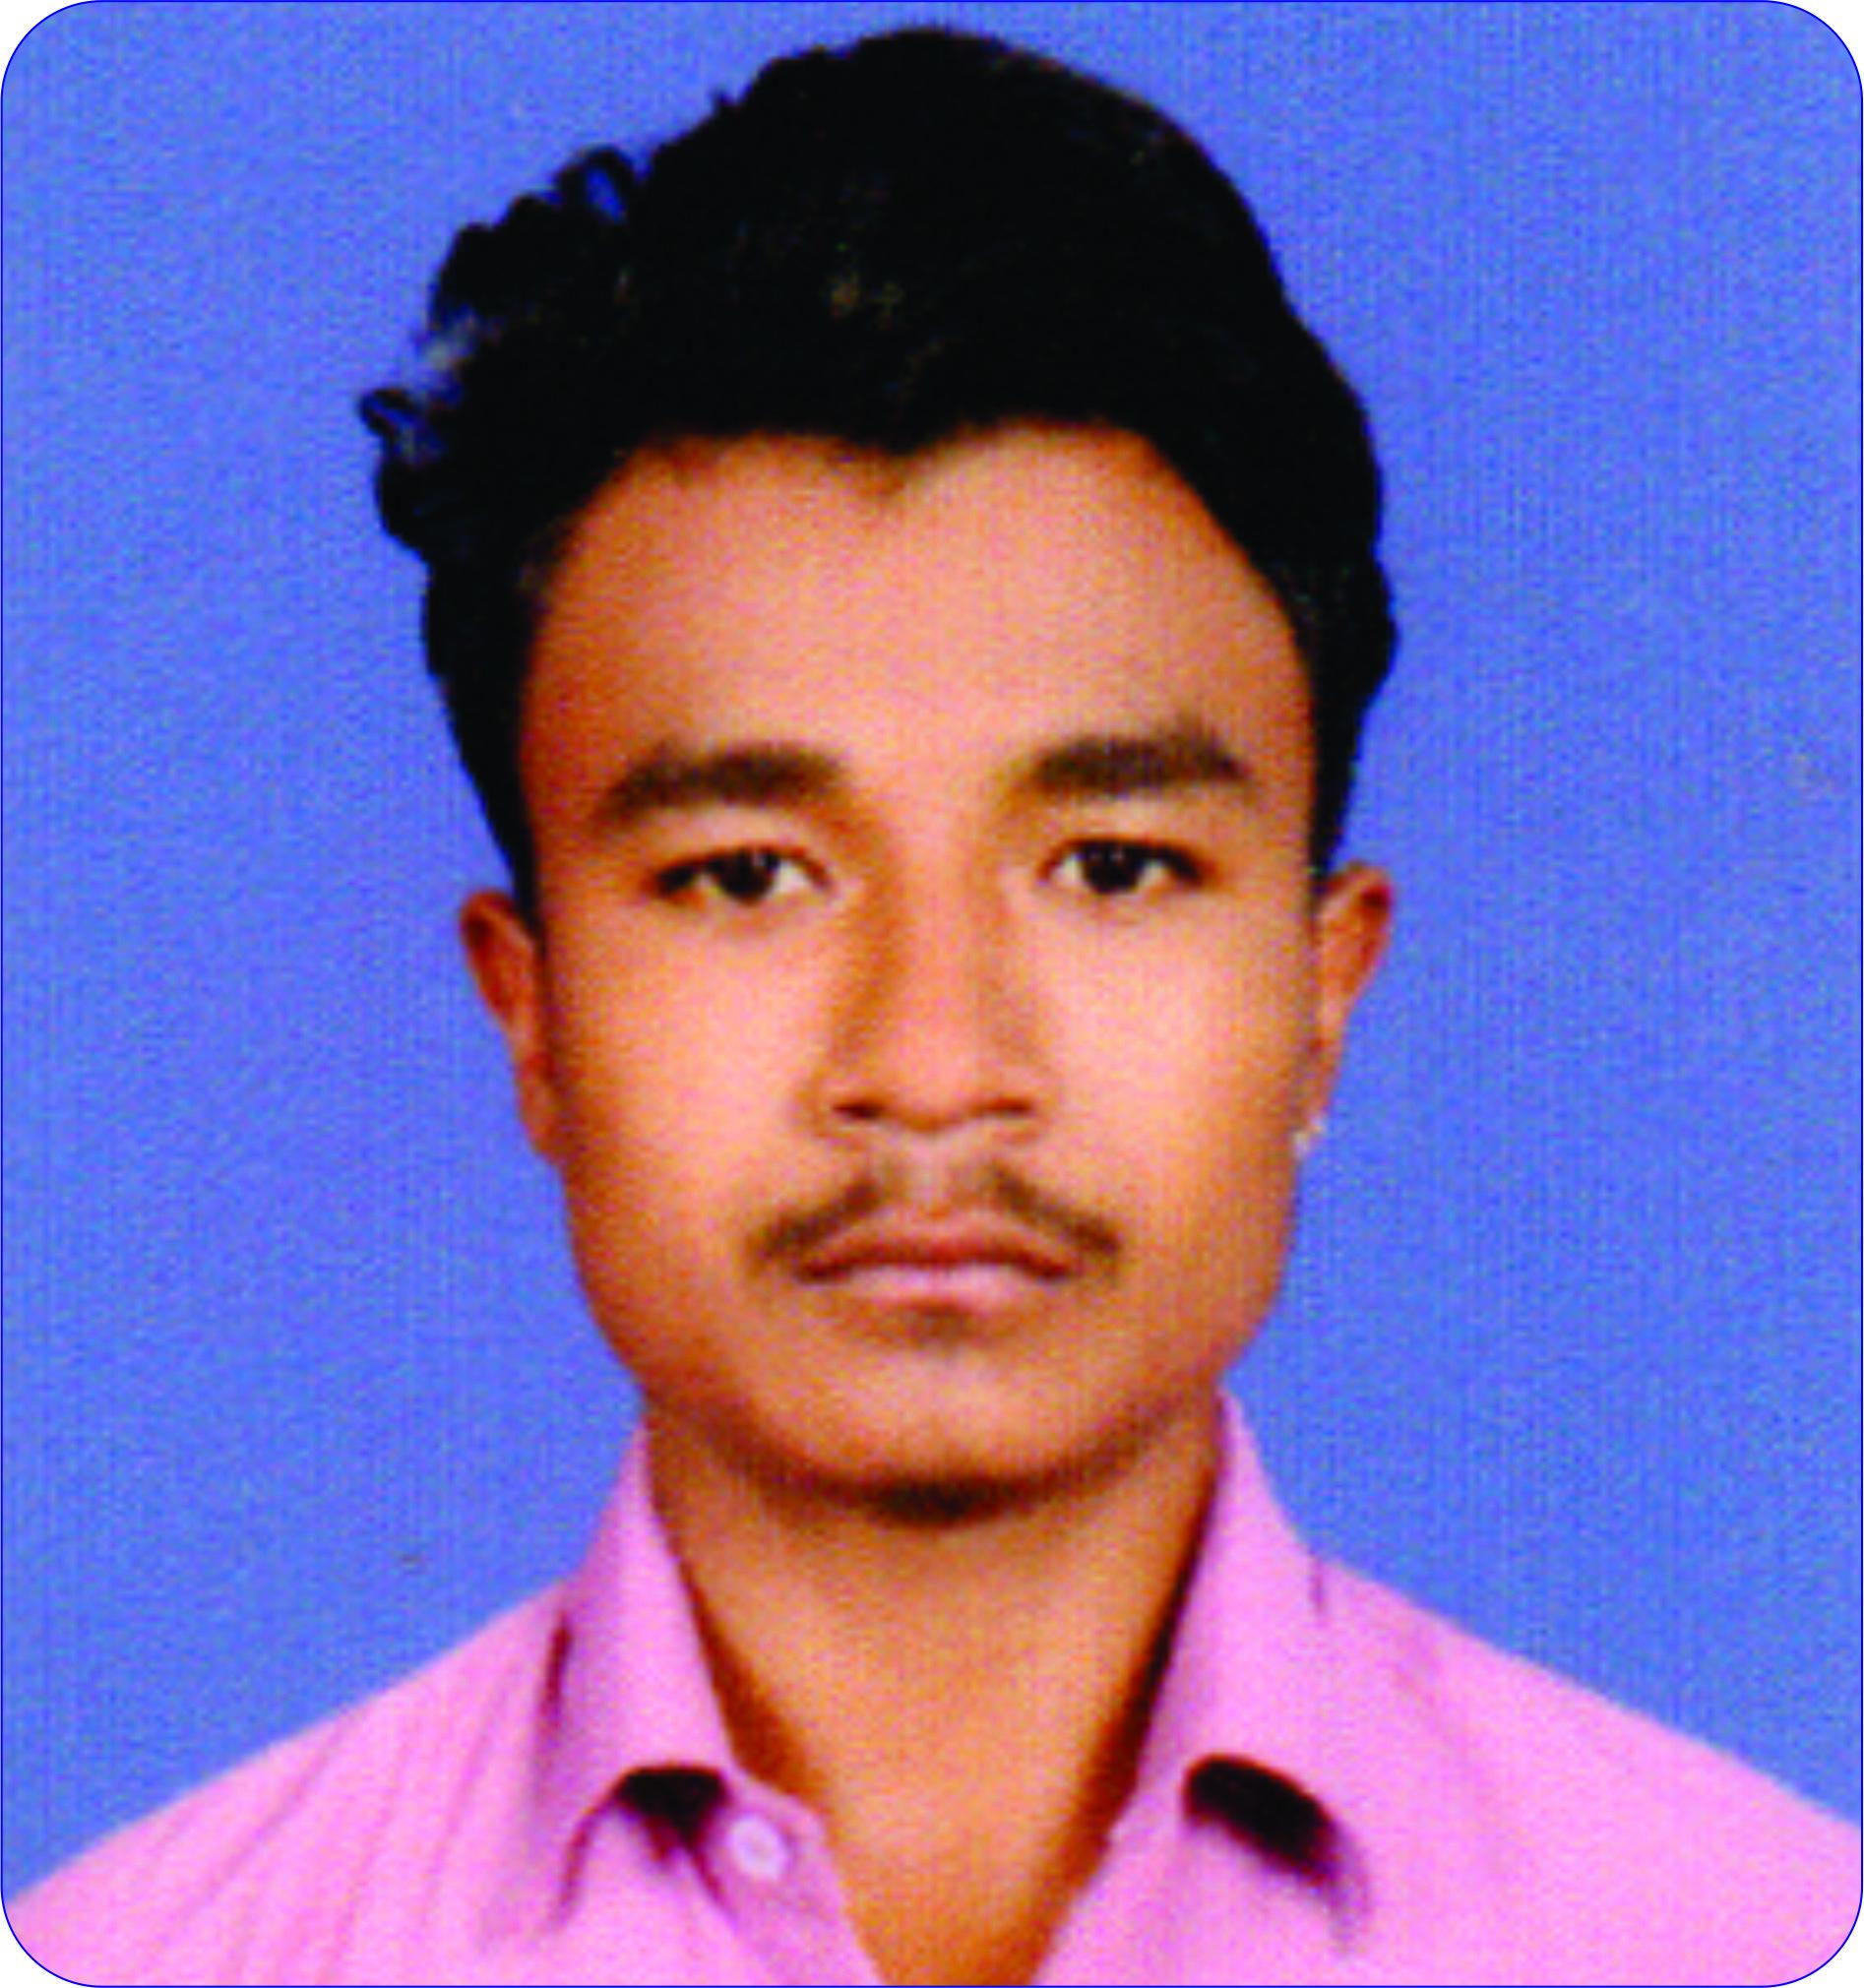 Rajkumar Tharu